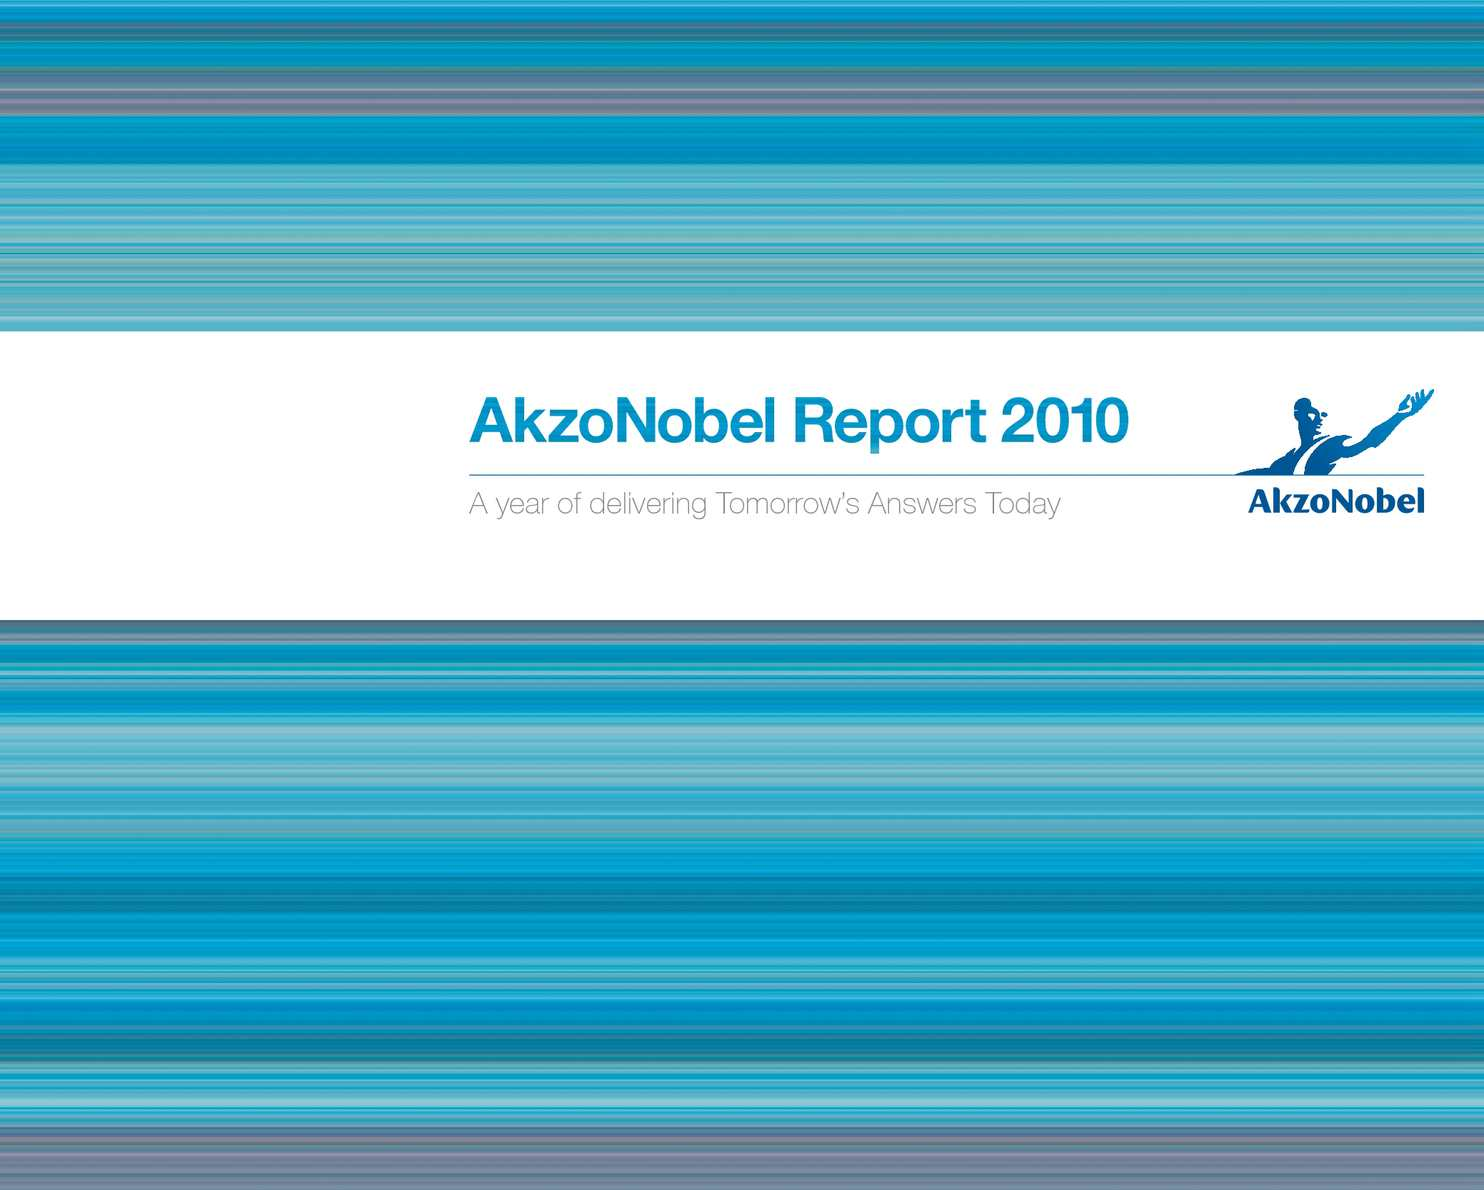 Calaméo - Akzonobel Report 2010